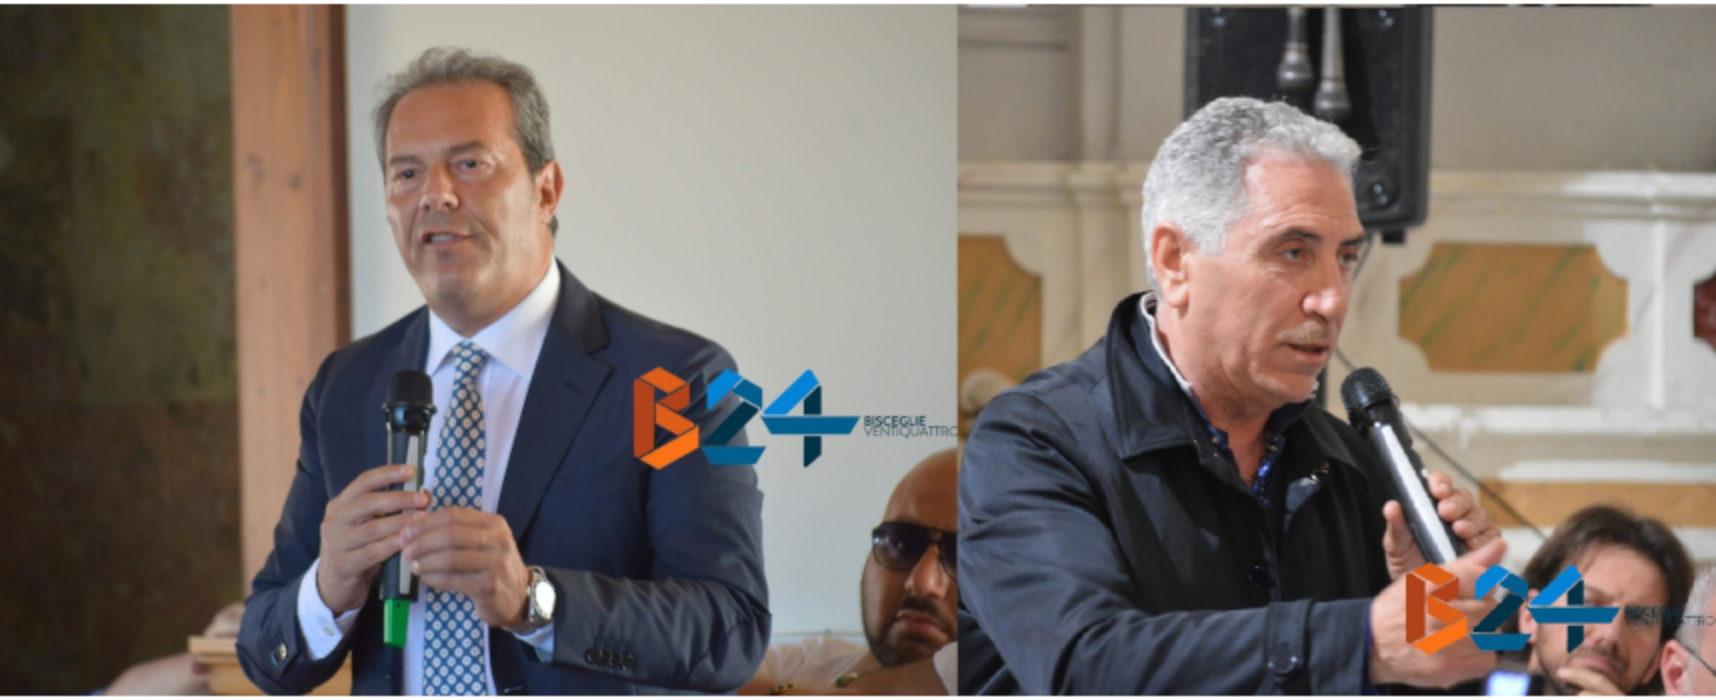 "Cimitero, Francesco Spina: ""Richiederò dimissioni assessore Parisi in consiglio comunale"""